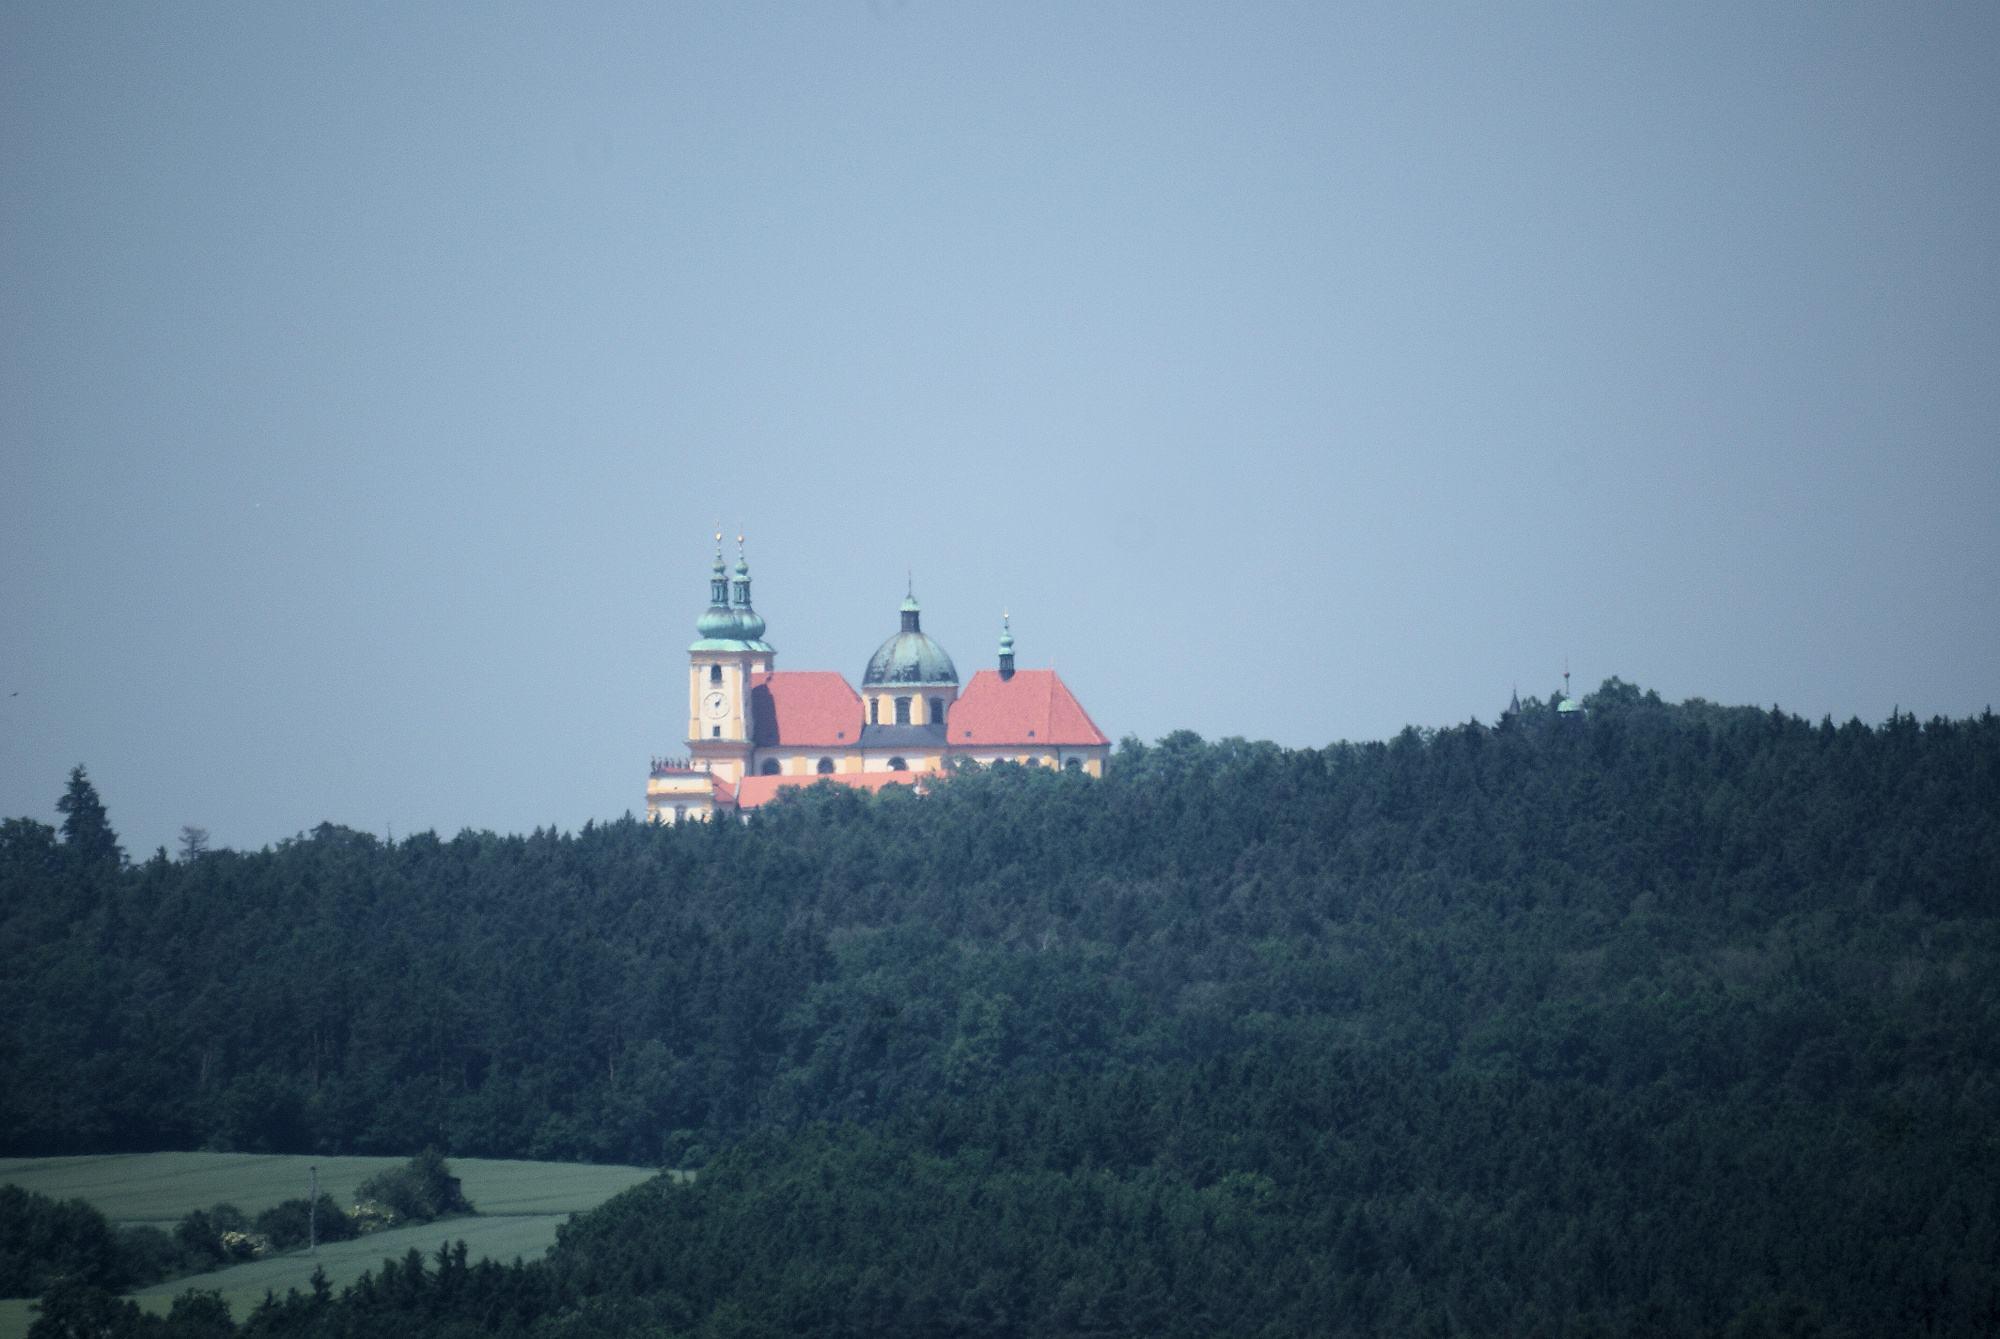 Obrázek ObjektivSonyReflex500mm6km